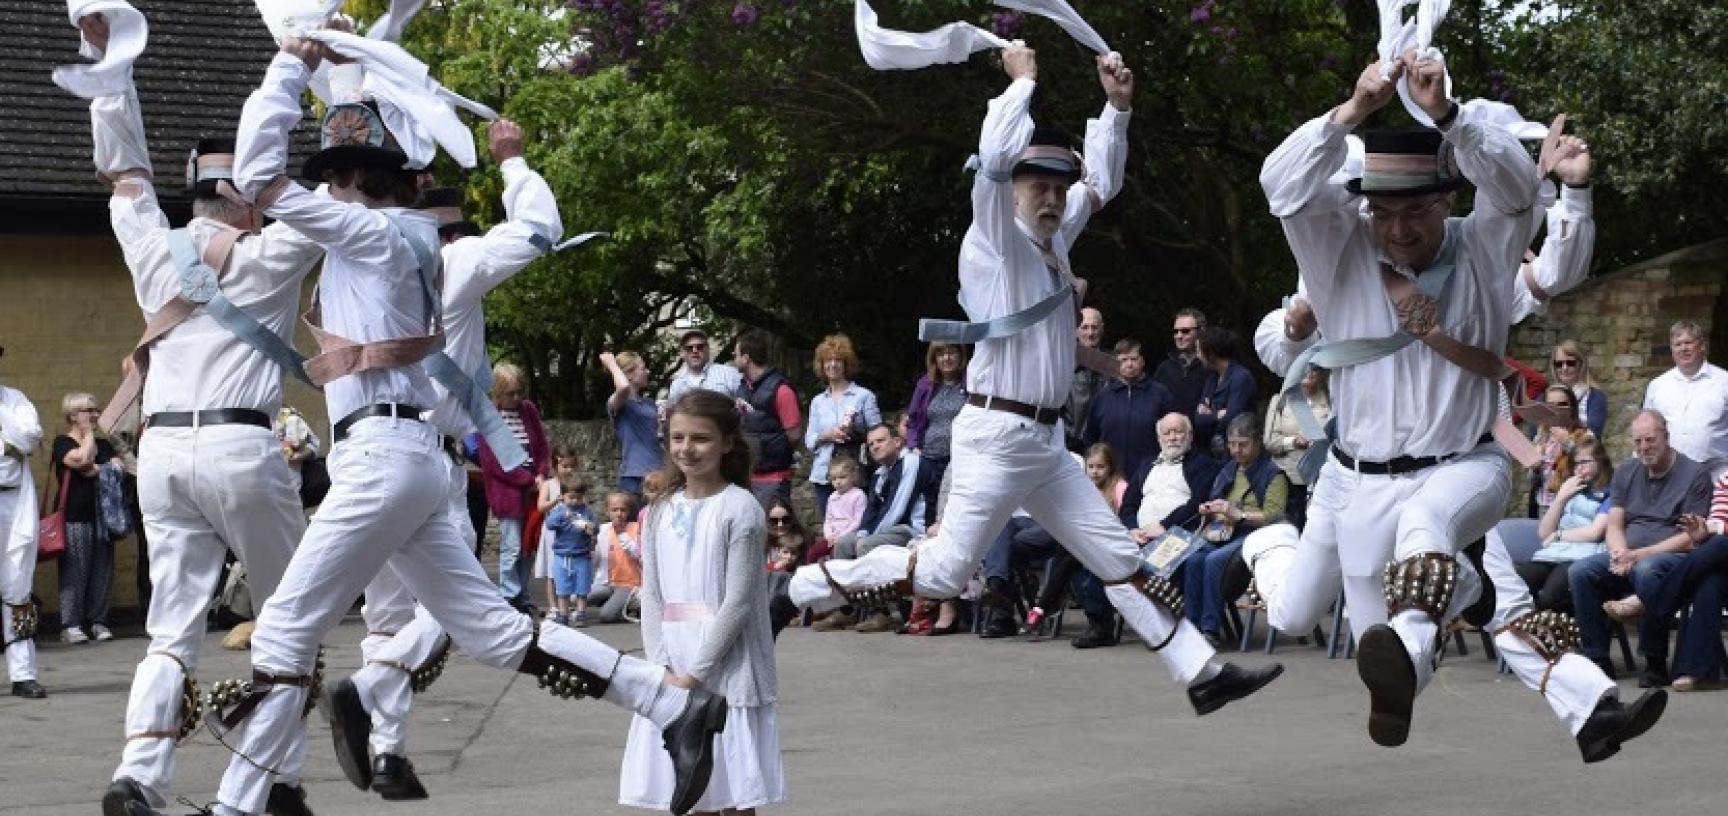 Dancing at the Kirtlington Lamb Ale 2016. (Courtesy Kirtlington Morris)